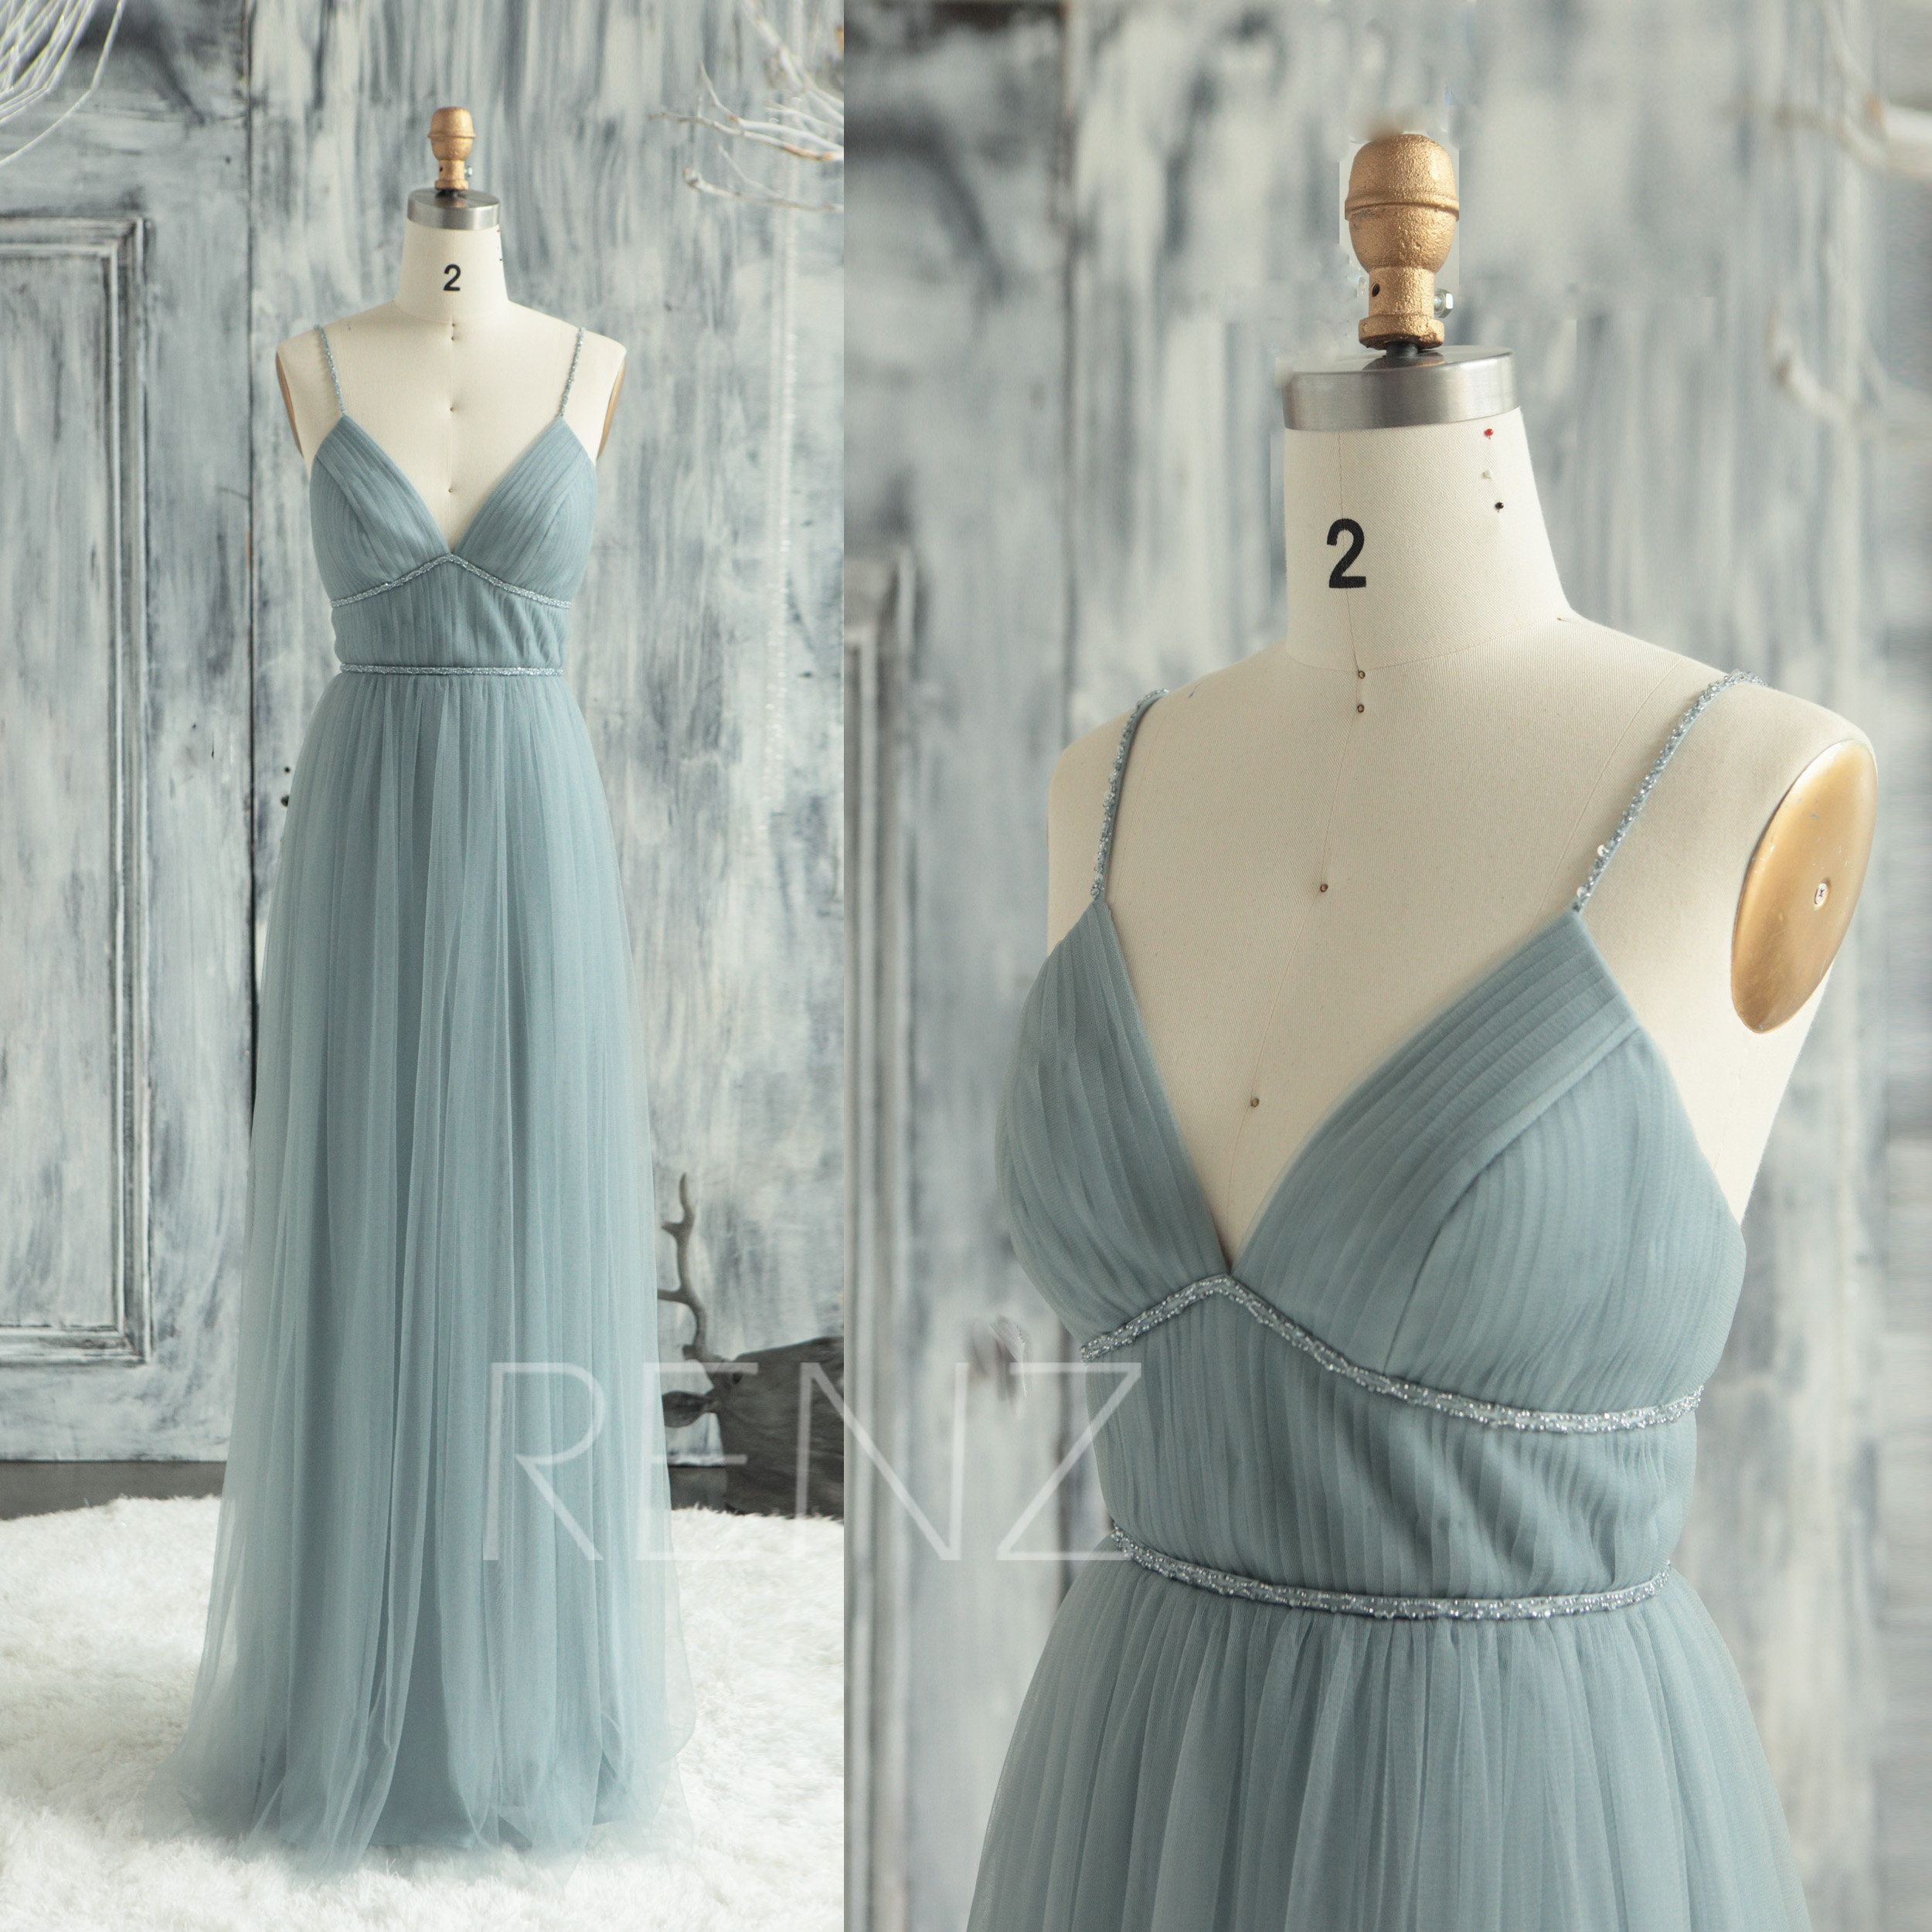 Prom Dress Dusty Blue Tulle Bridesmaid Dress V Neck Wedding Dress Beaded Spaghetti Strap Forma Pleated Wedding Dresses Pleated Party Dress V Neck Wedding Dress [ 2500 x 2500 Pixel ]